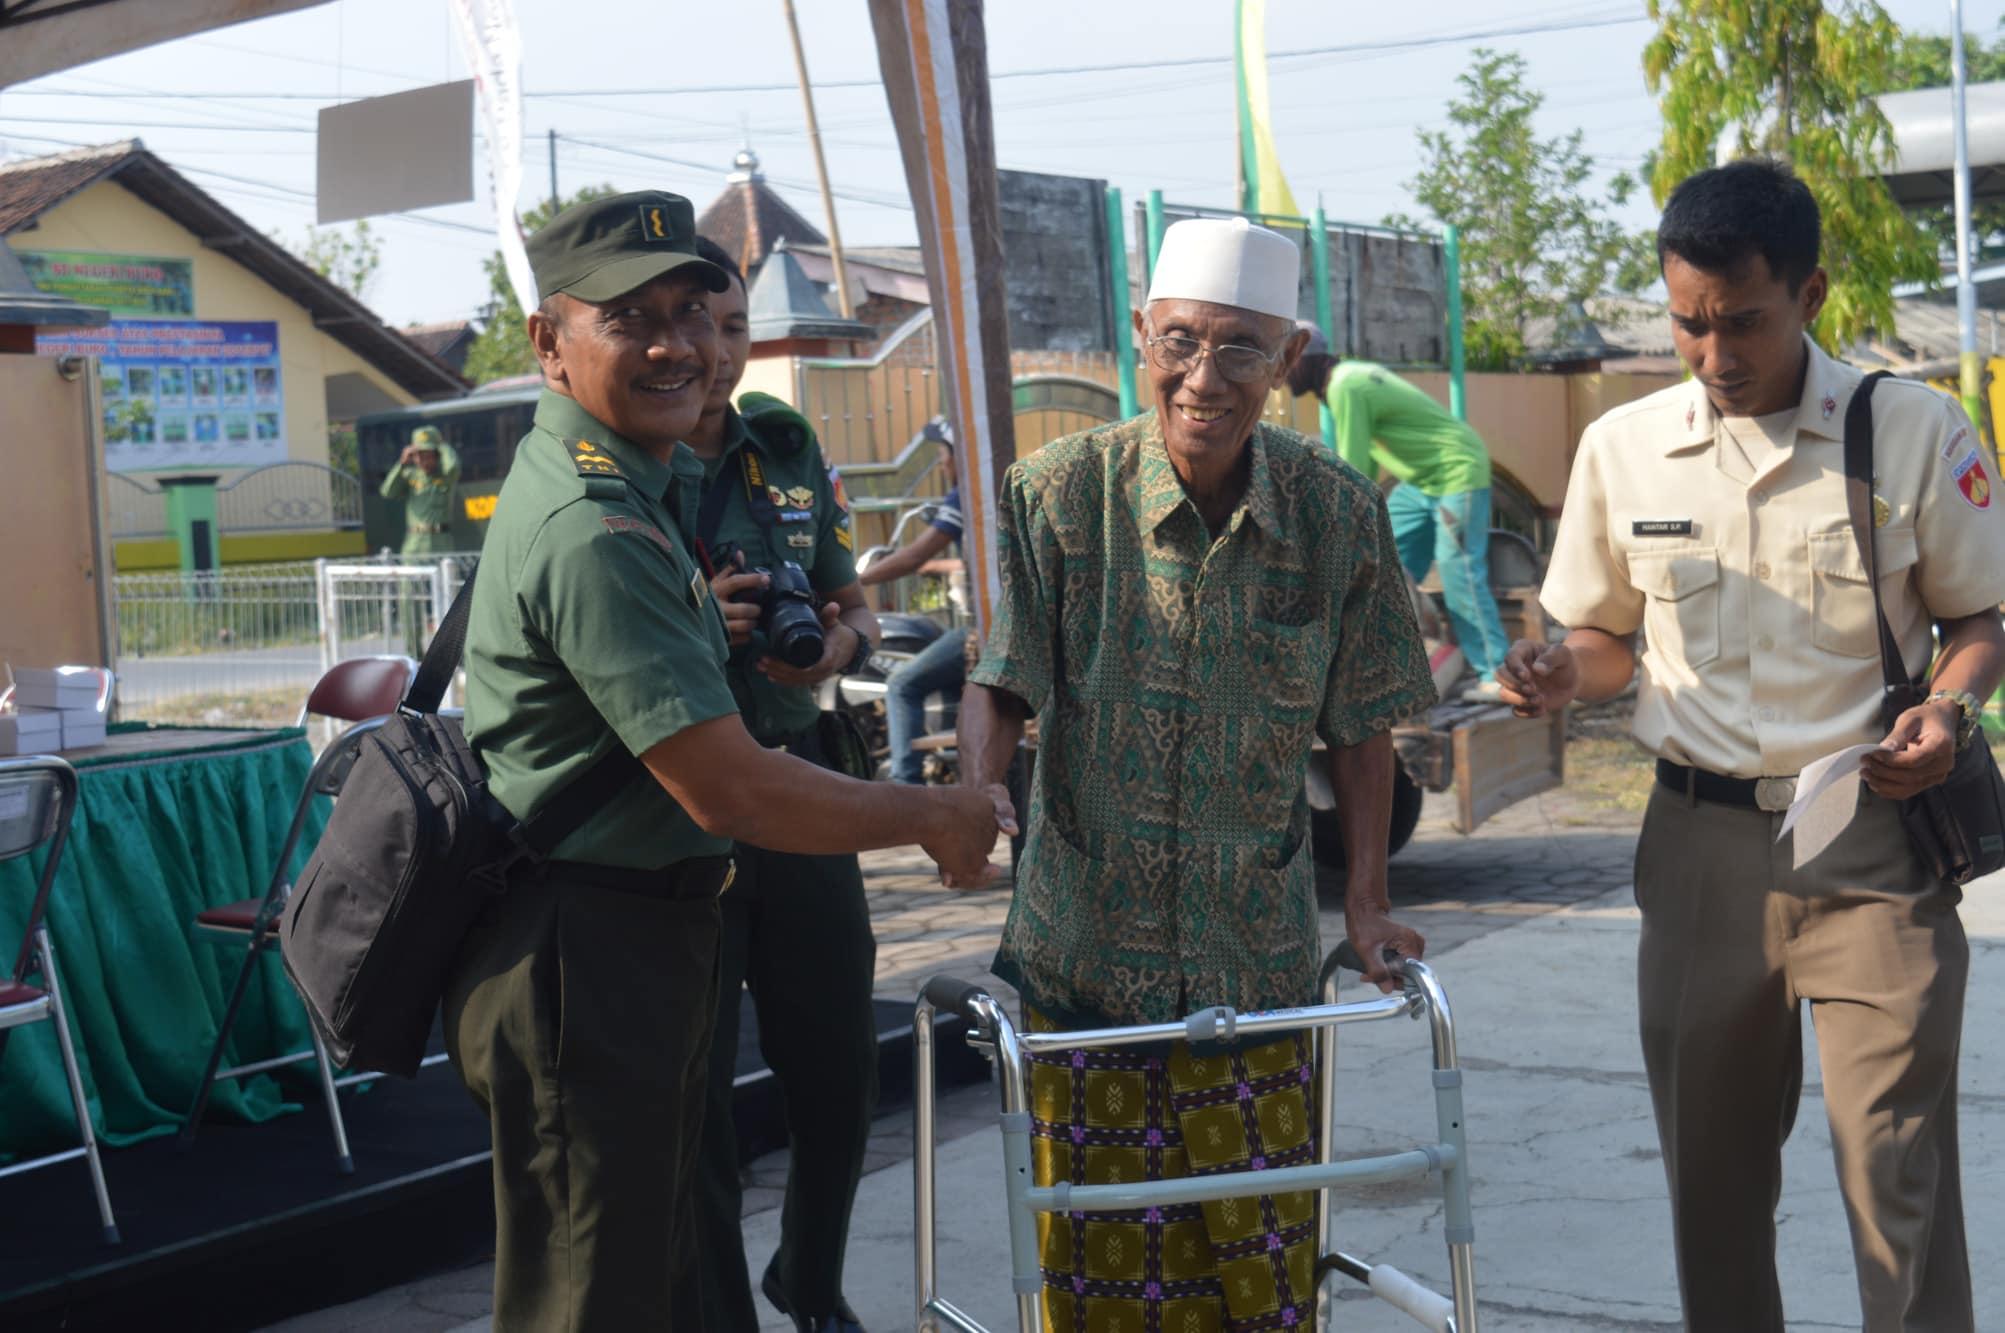 Gandeng Djarum Foundation, TNI Gelar Baksos Pengobatan Massal